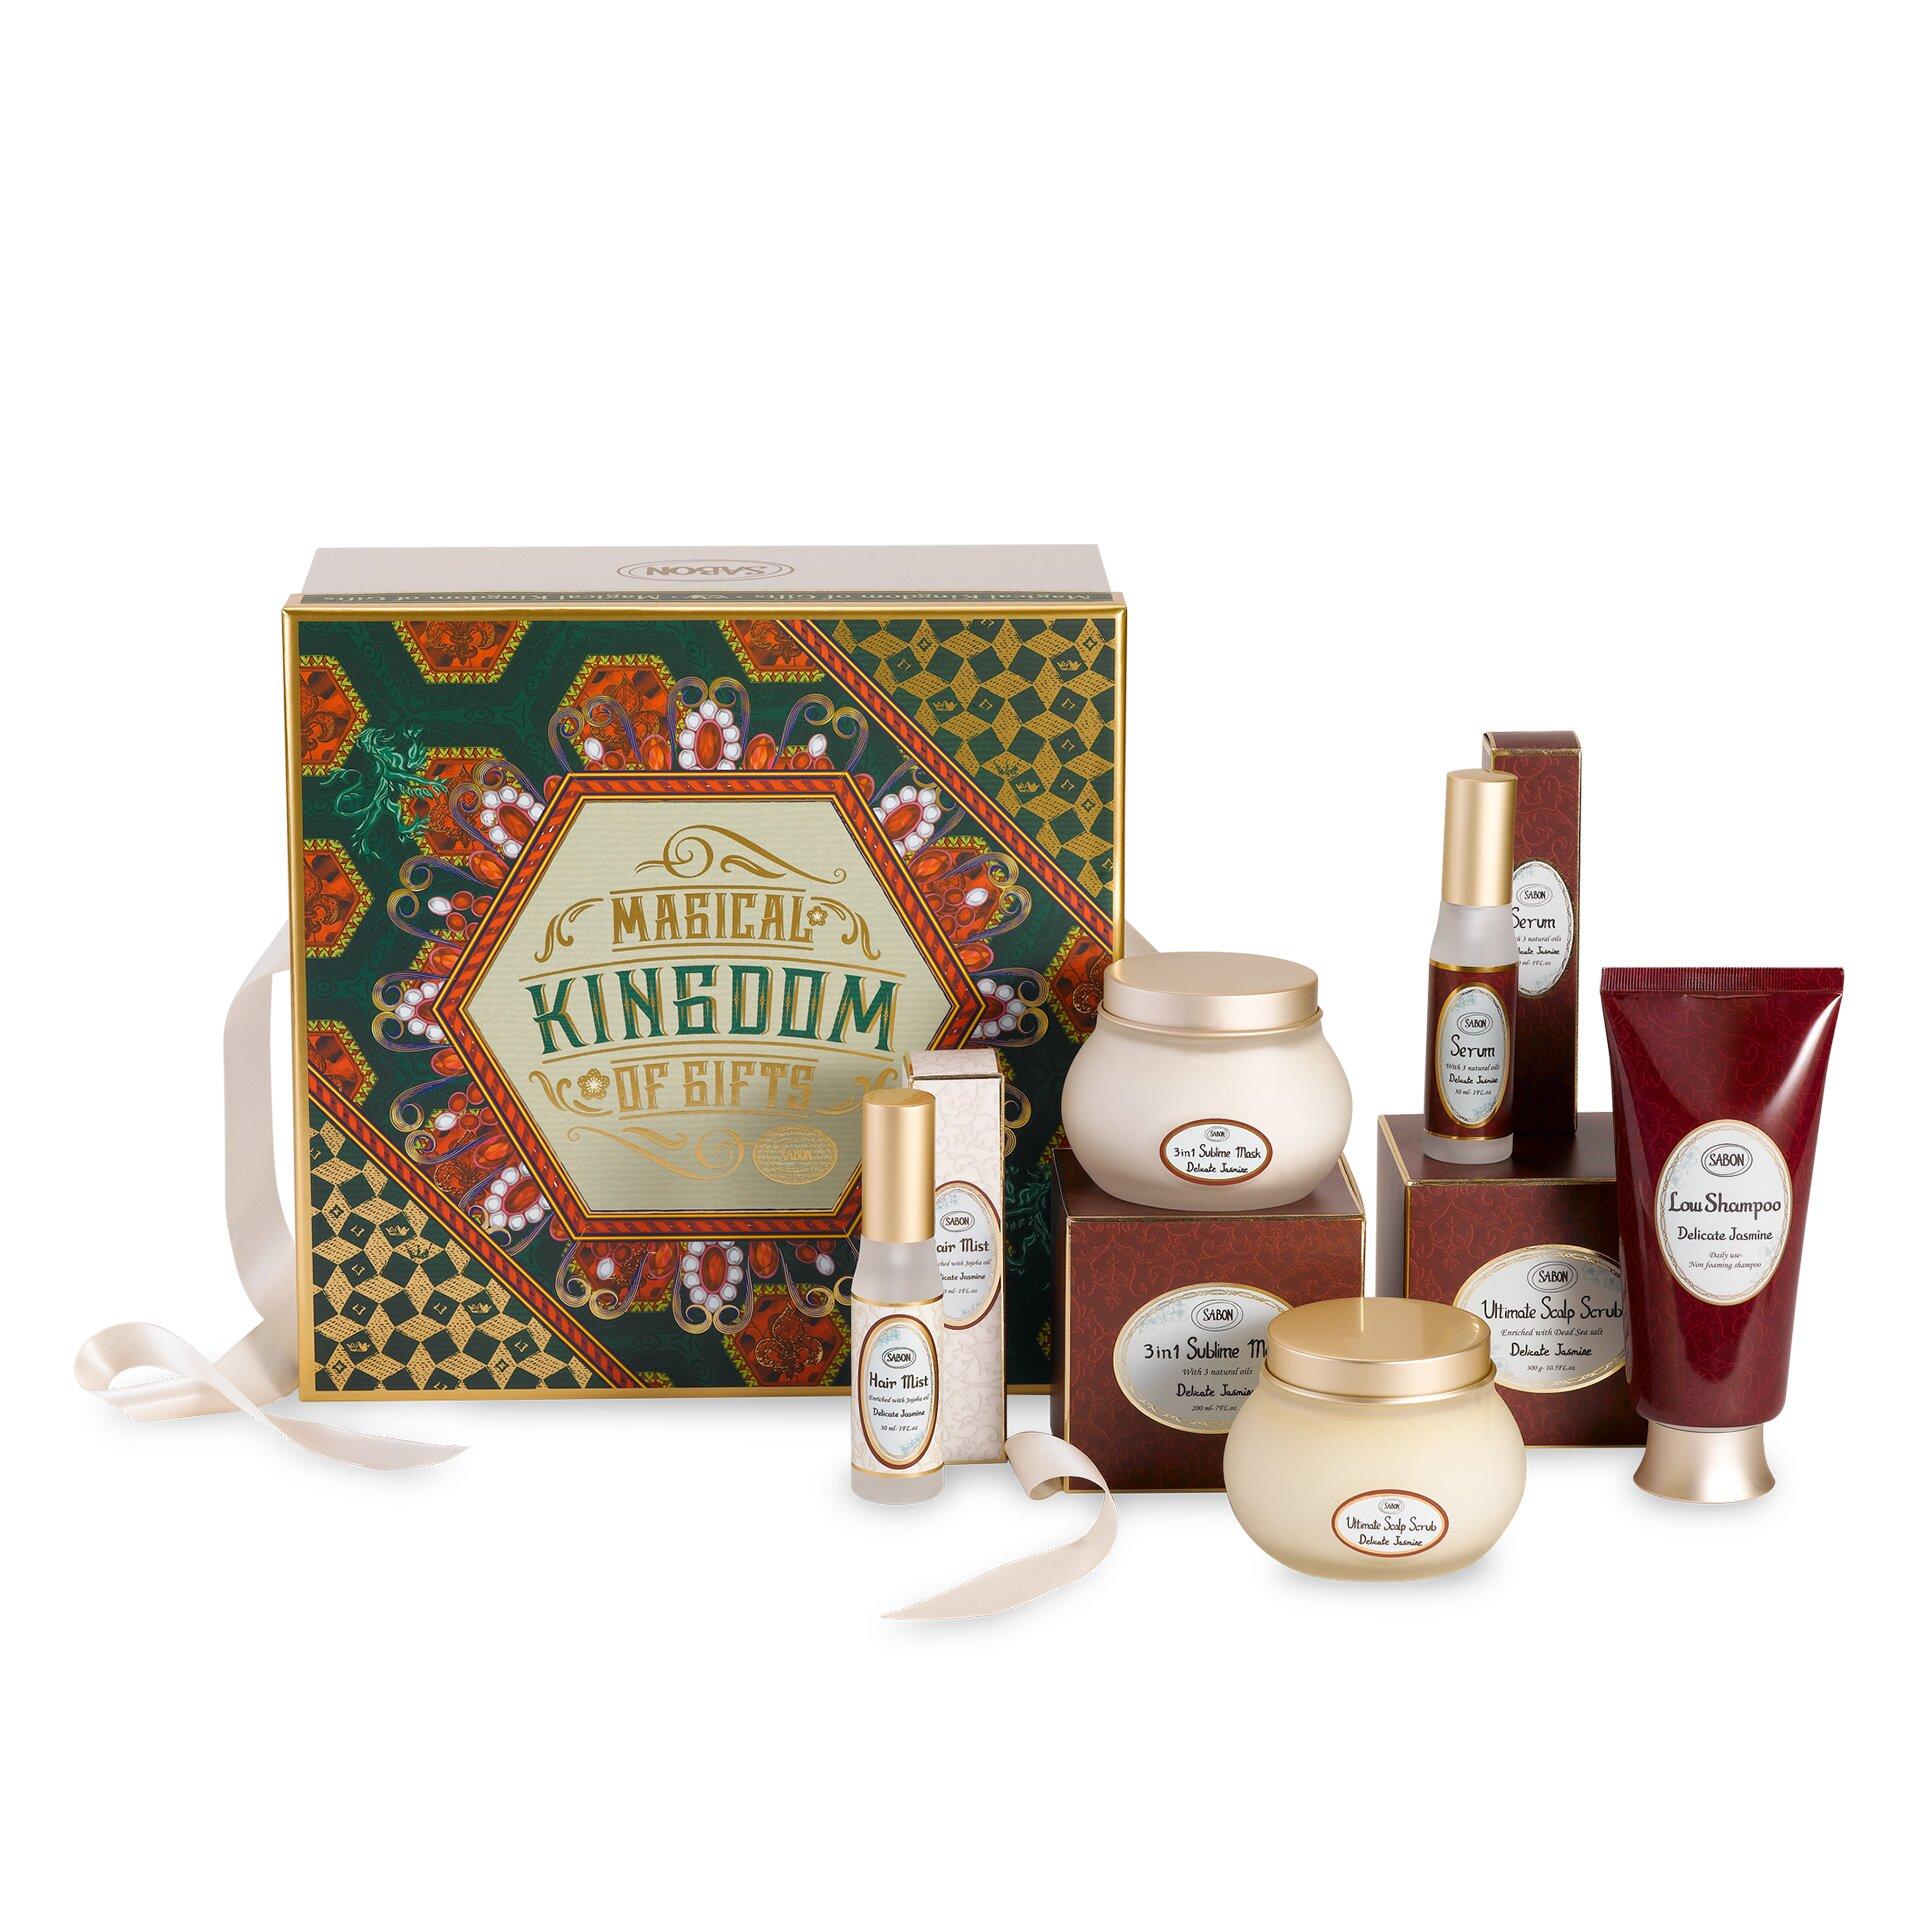 Gift Set Premium - Delicate Jasmine - 2